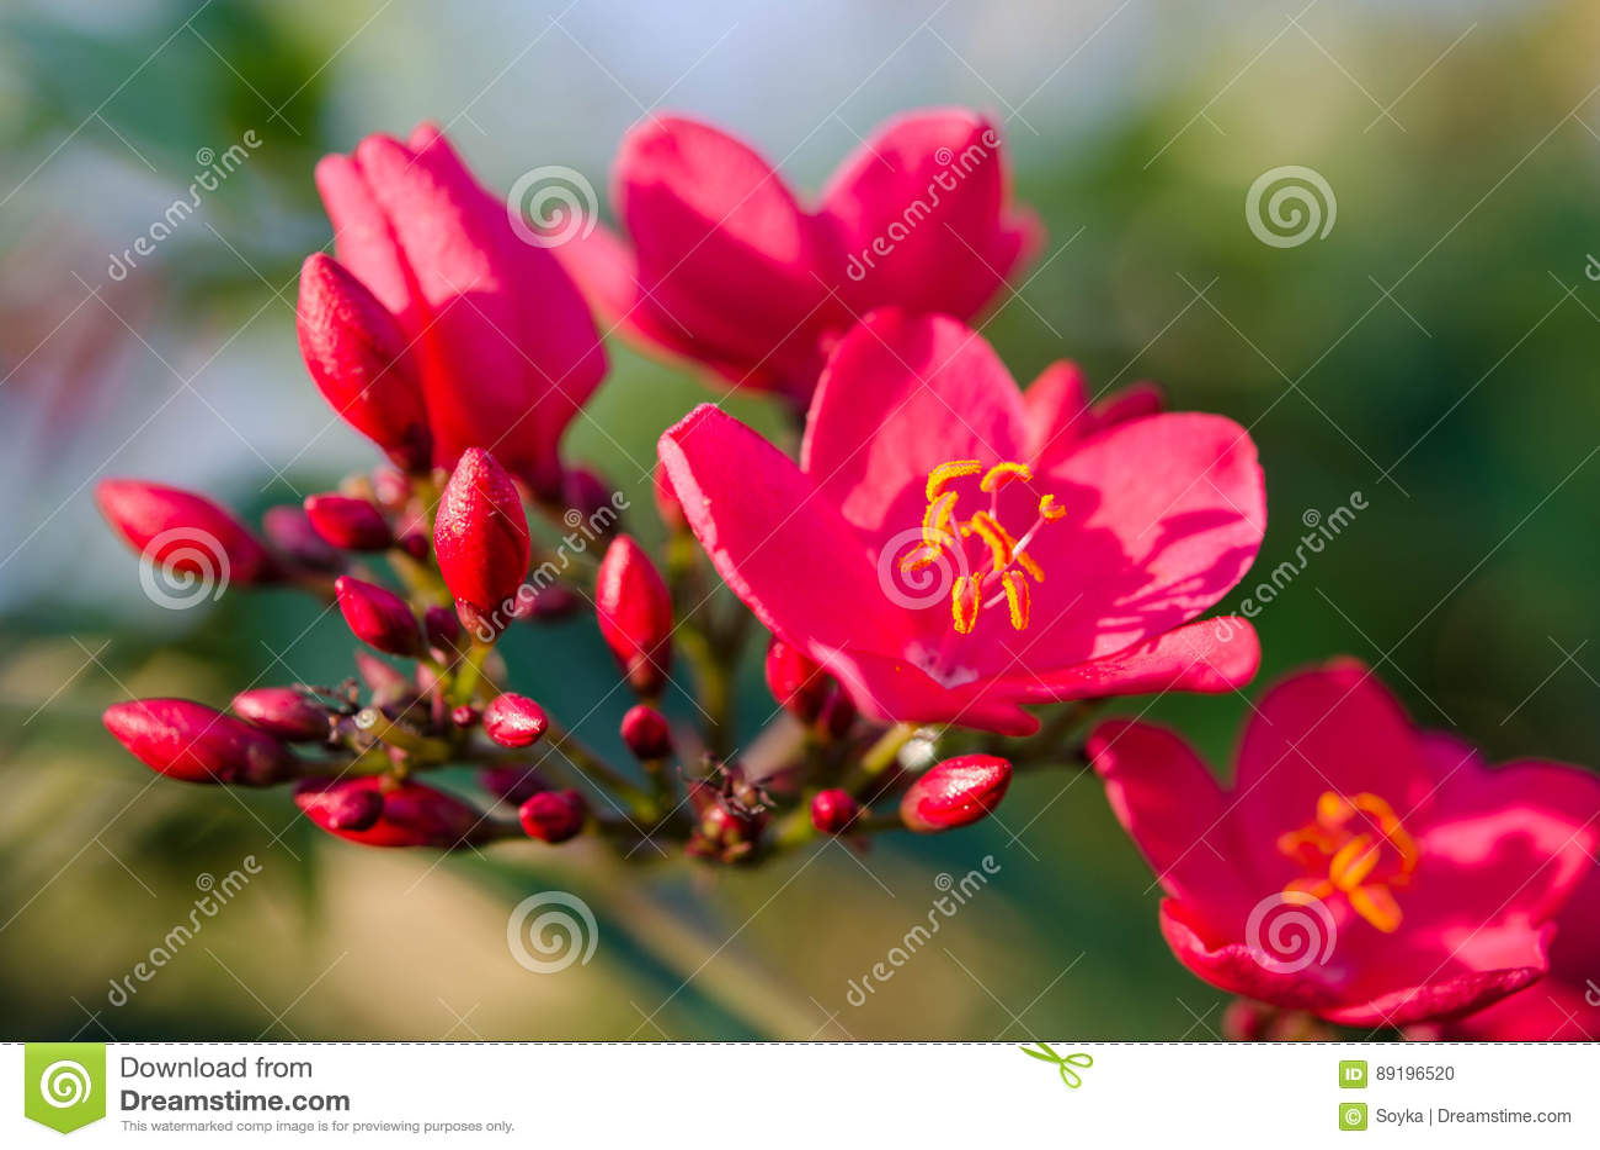 Flowering Bushes With Pink Flowers Stock Photo Image Of Botany